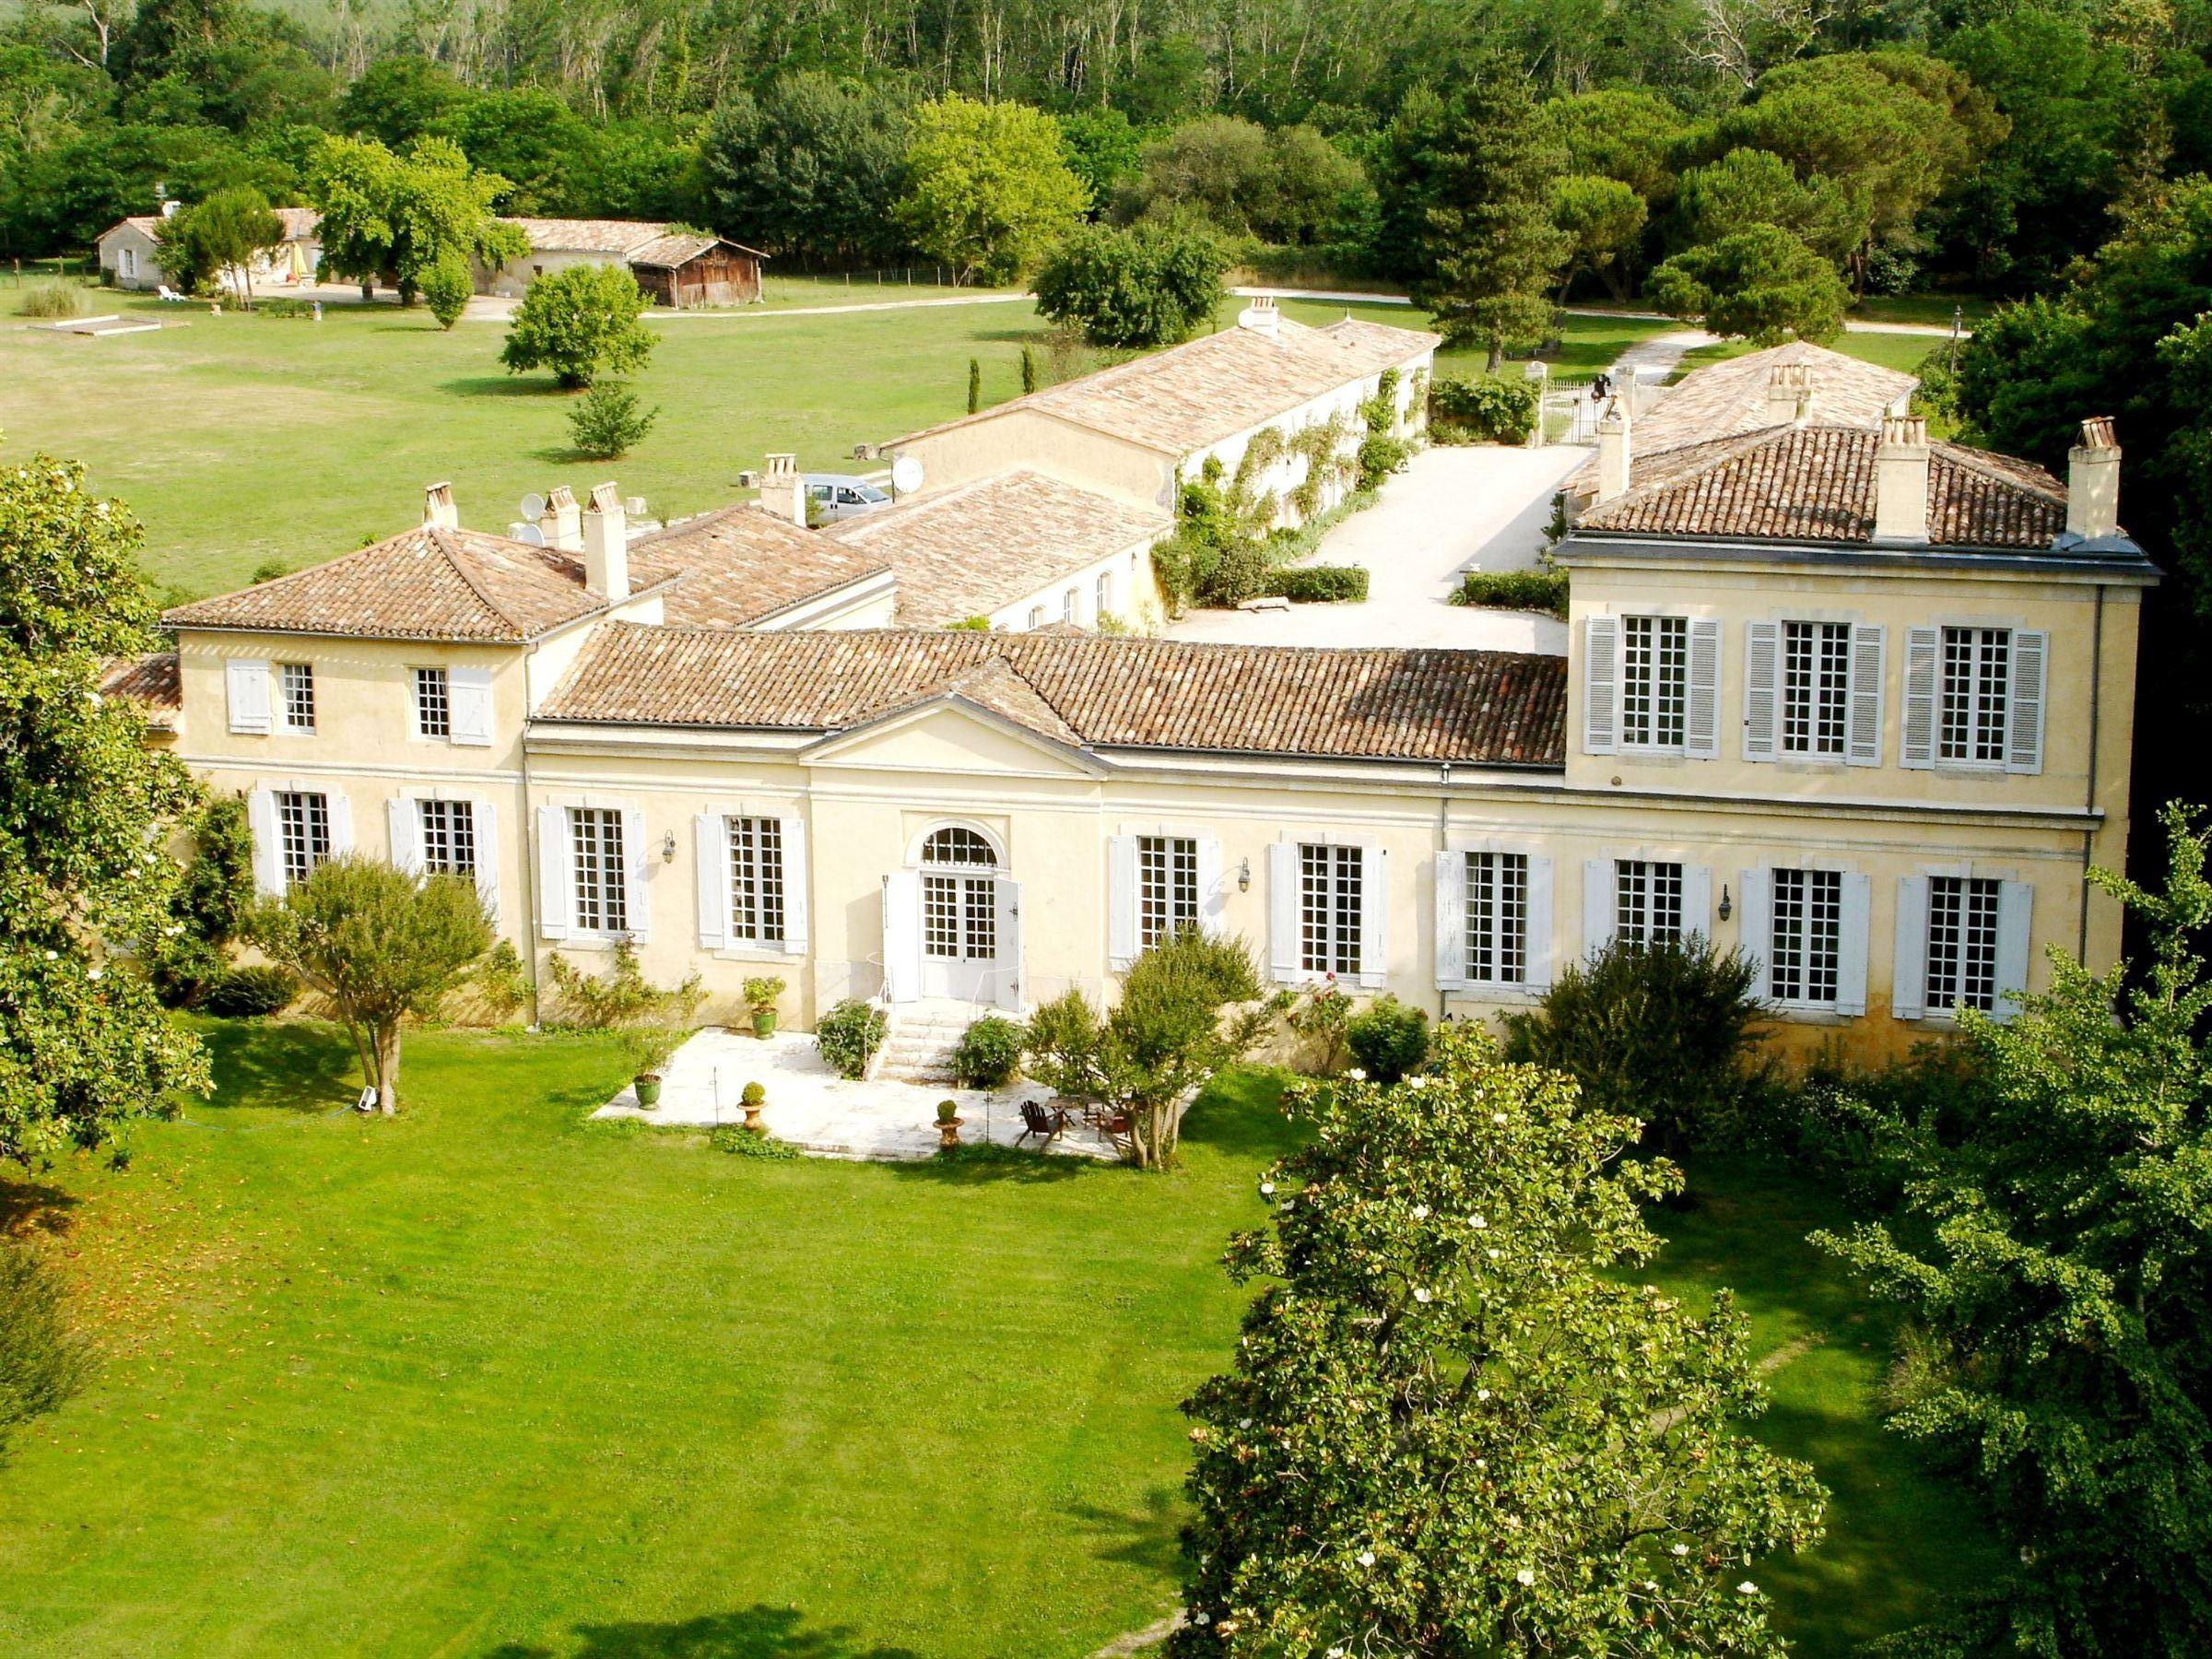 Casa Unifamiliar por un Venta en STUNNING ESTATE - 10KM FROM DOWNTOWN BORDEAUX- EASY ACCESS TO THE AIRPORT Bordeaux, Aquitania, 33000 Francia